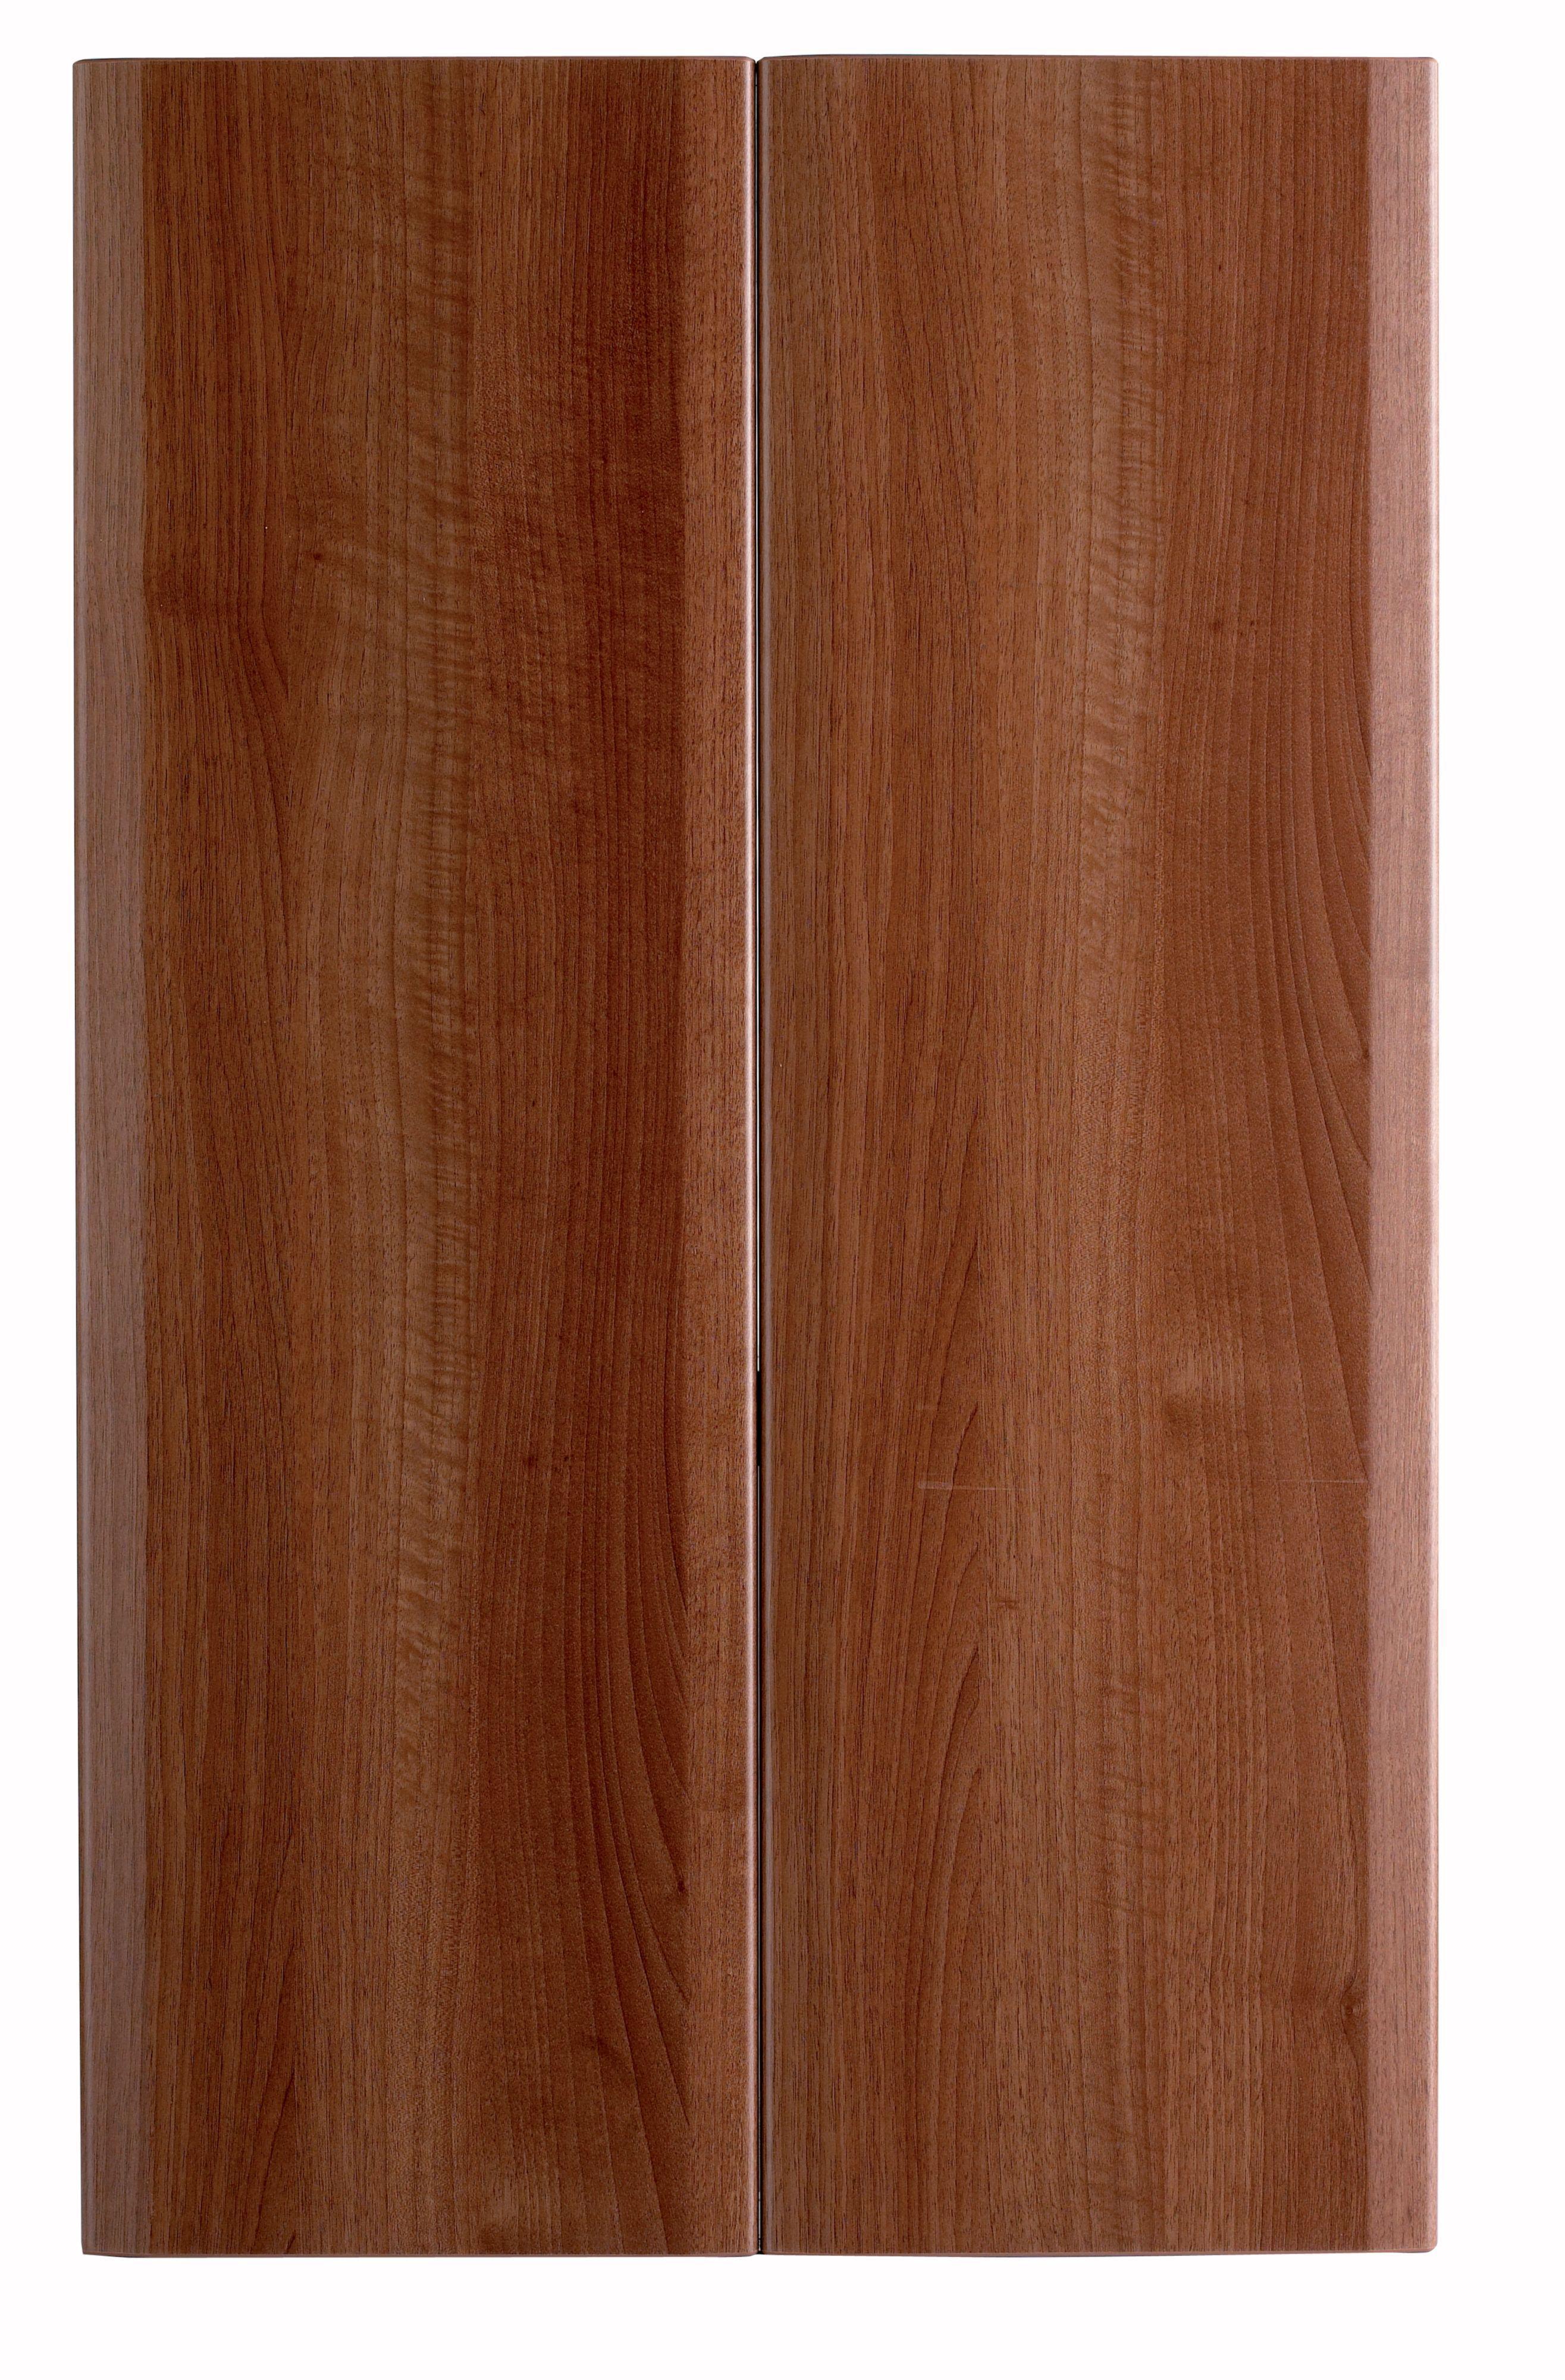 It Kitchens Sandford Walnut Effect Modern Larder Door (w)300mm, Set Of 2